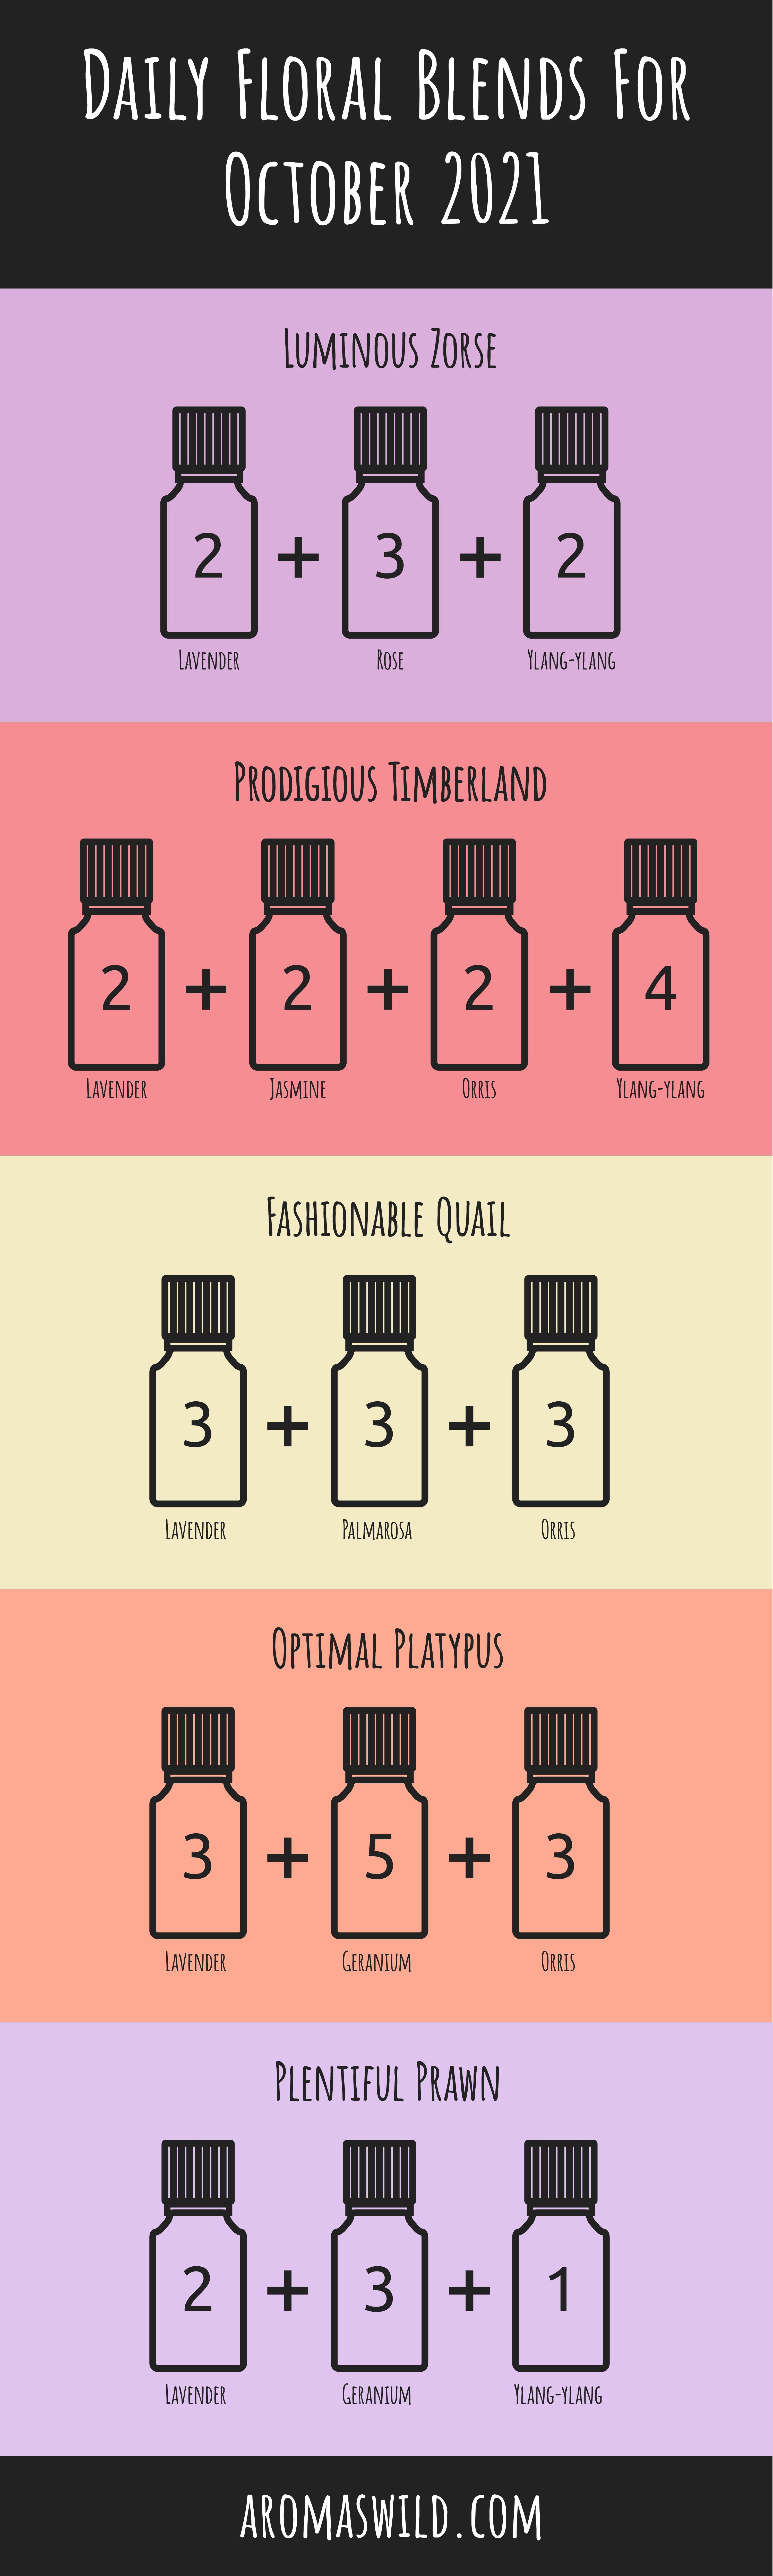 Best Floral Essential Oil Recipe – Daily Floral Blends For 17 October 2021